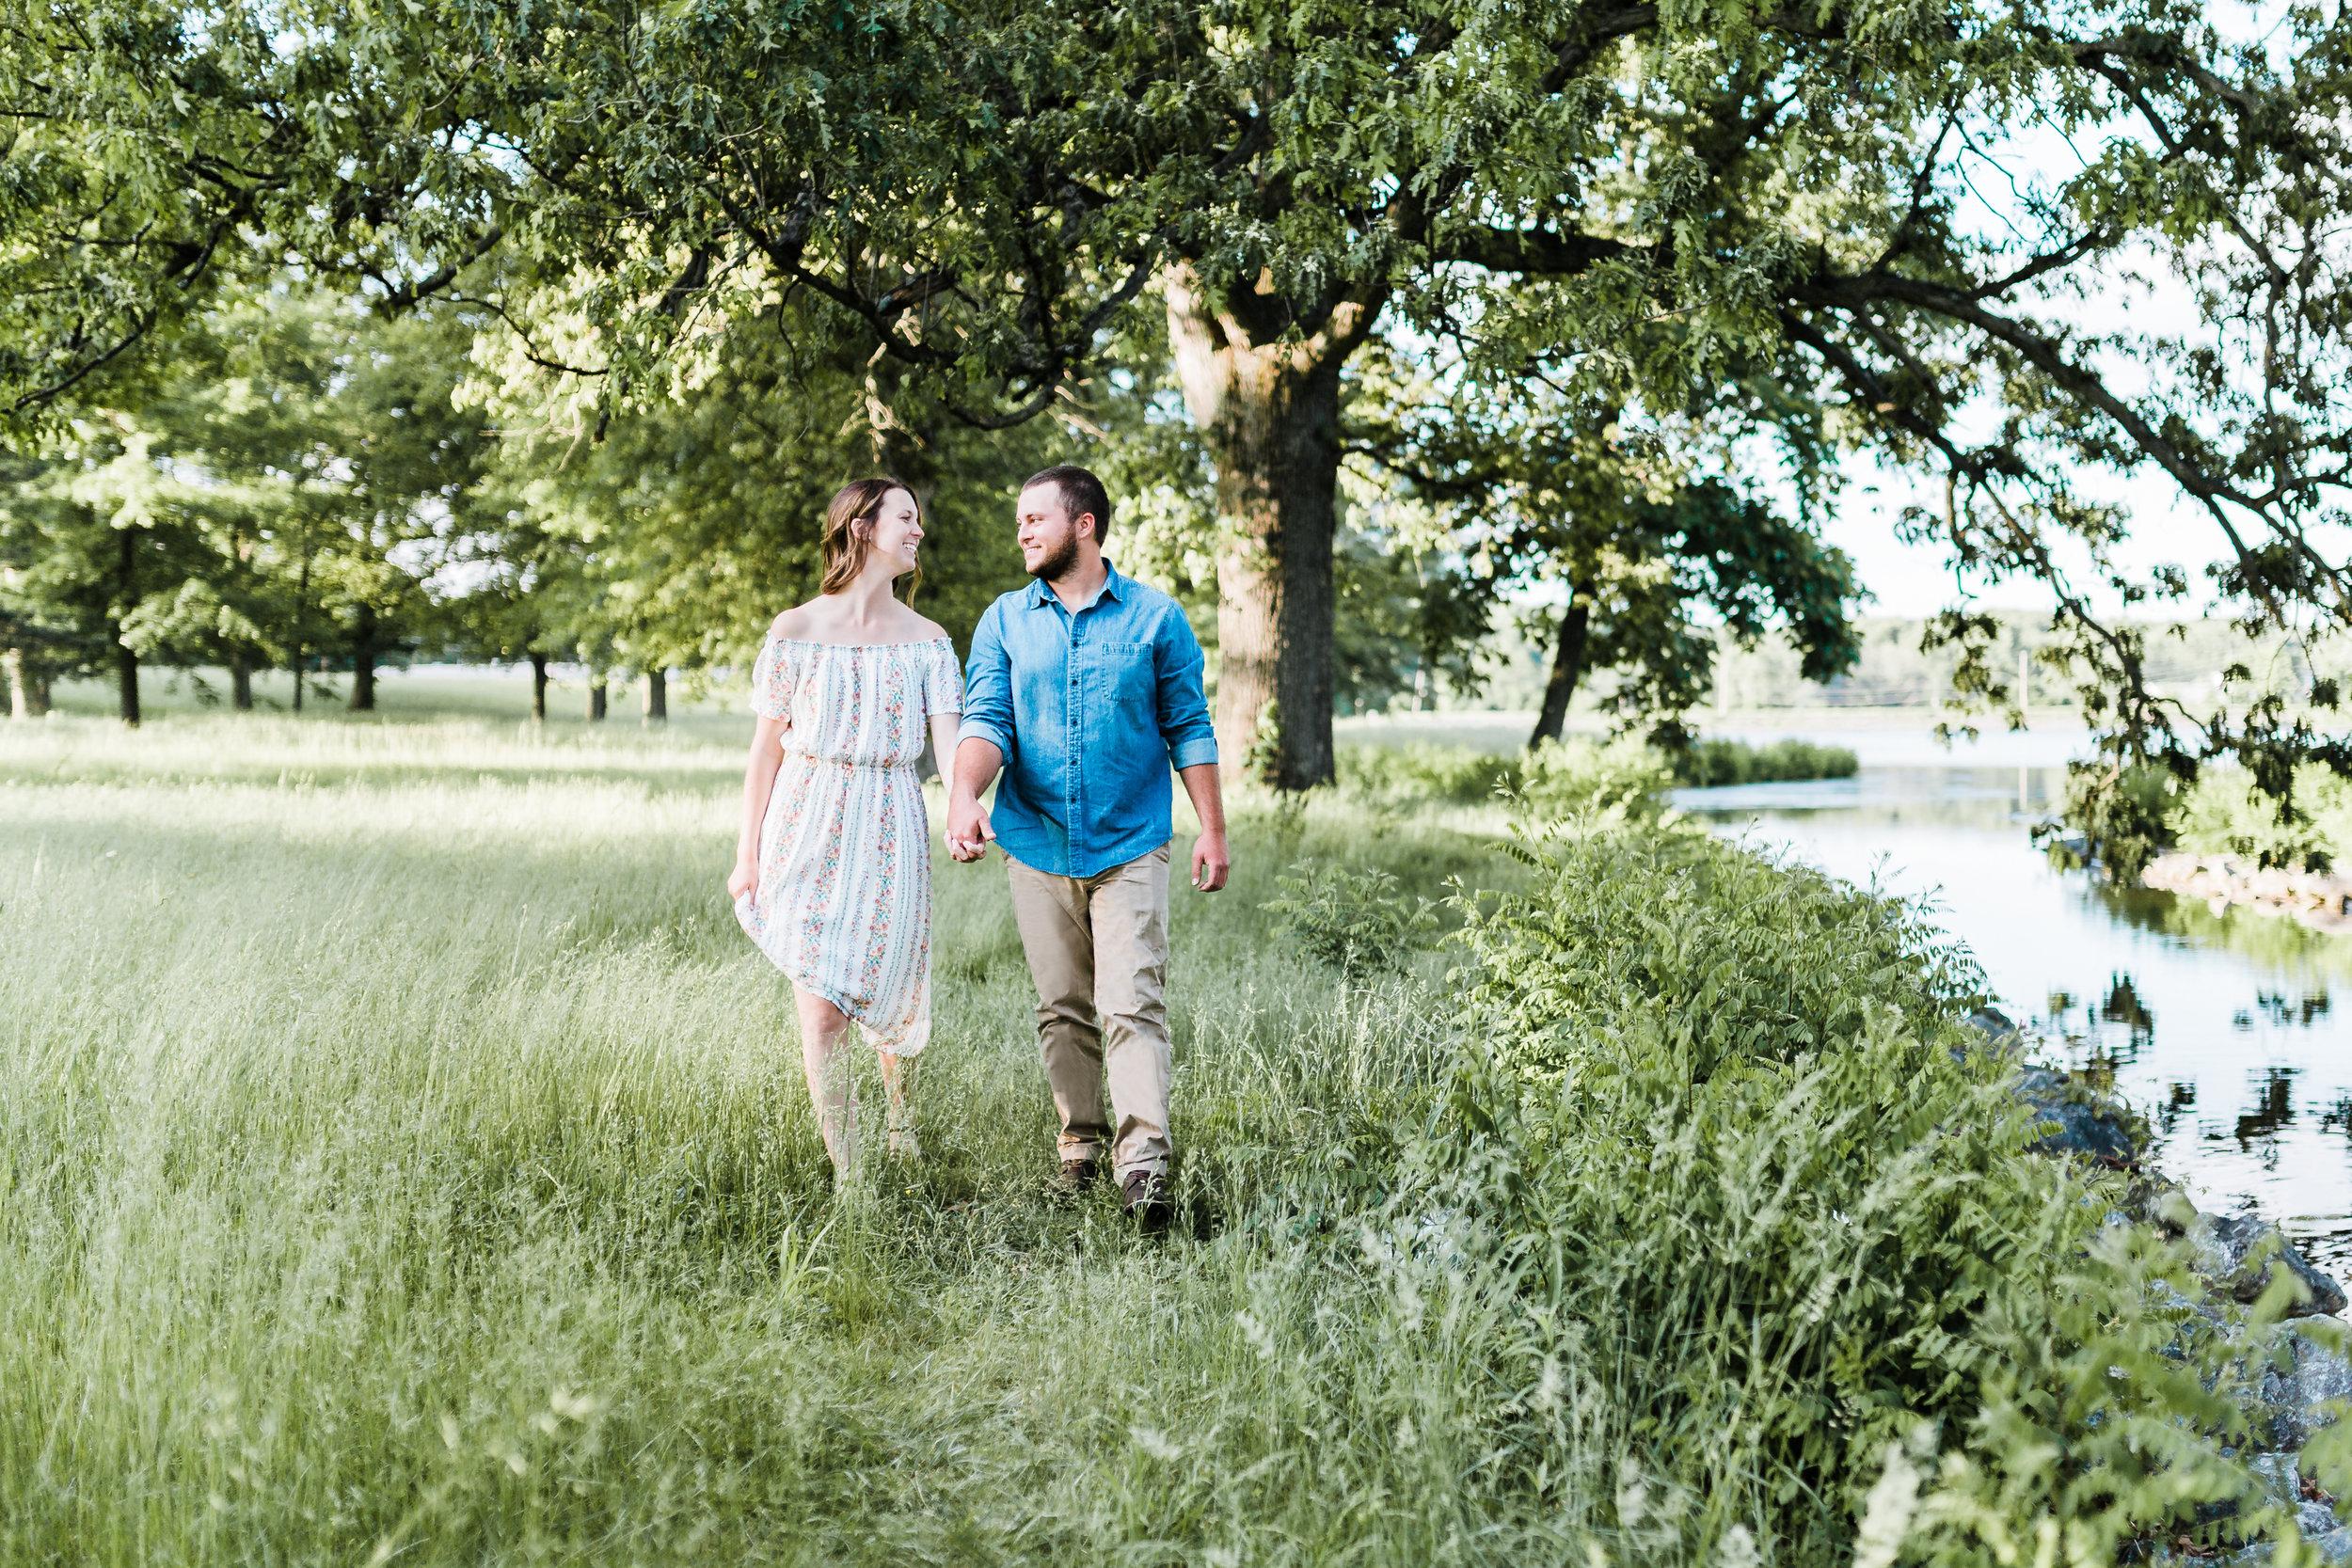 maryland engagement photographer - couple holding hands and walking